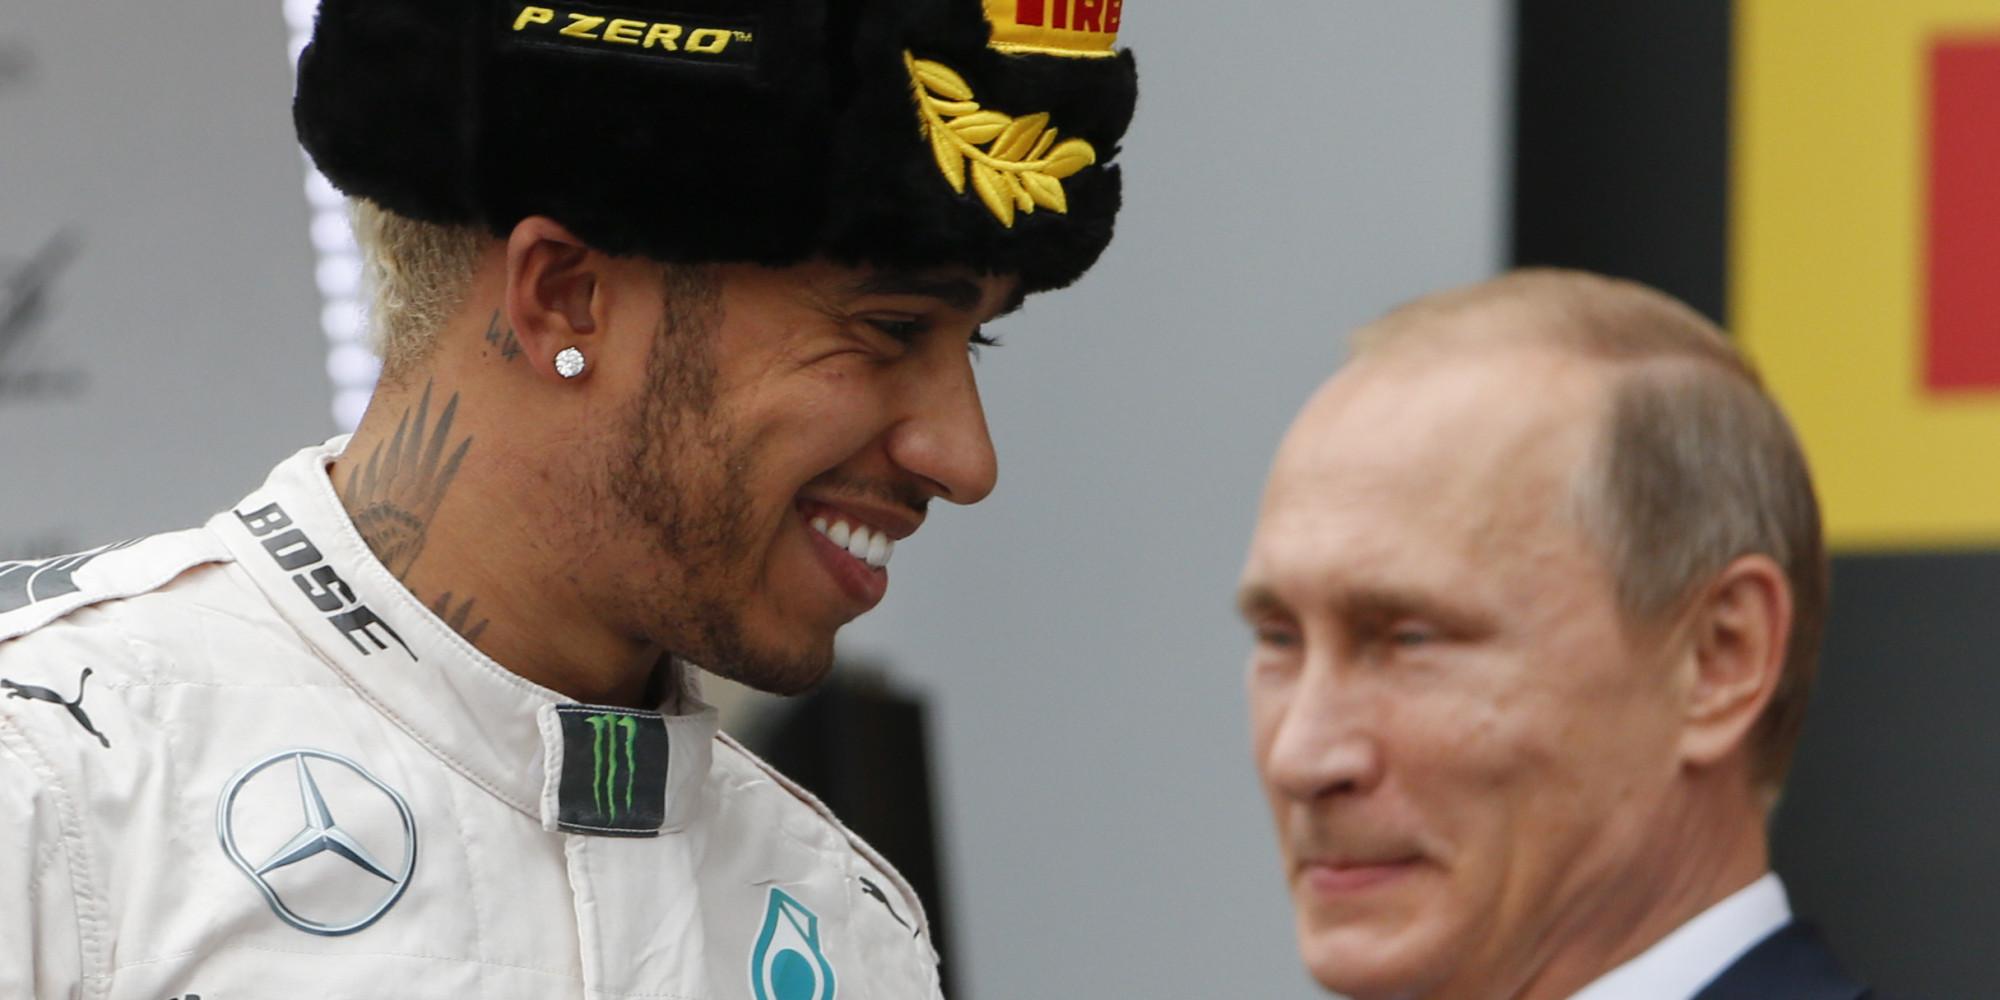 Lewis Hamilton Sprays Vladimir Putin With Champagne At